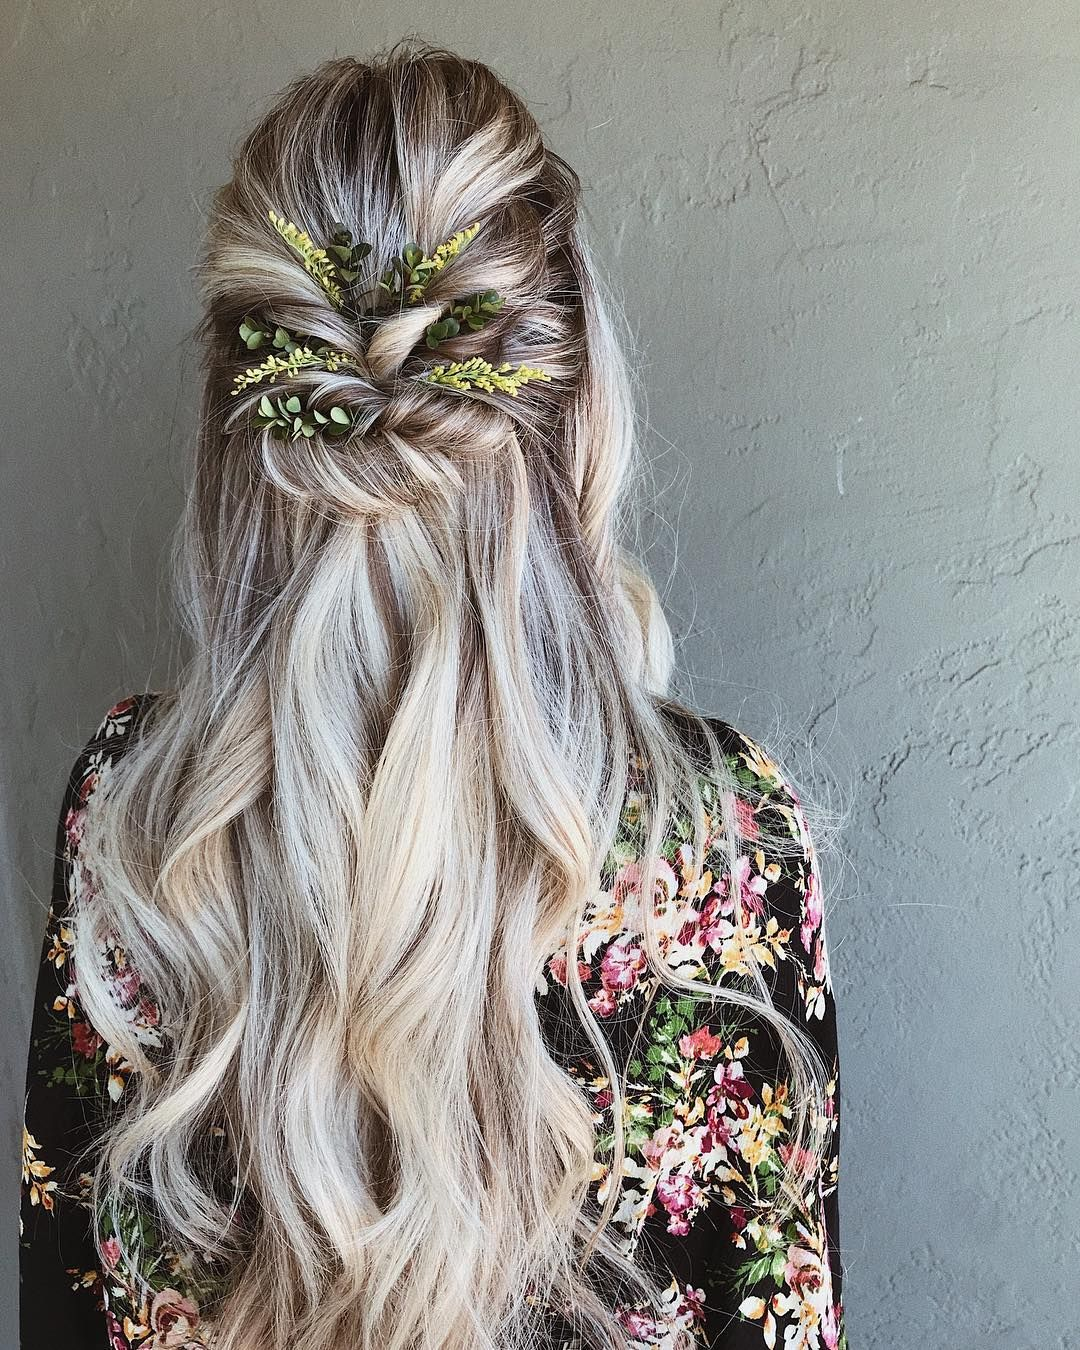 Braids half up half down hairstyle , boho hairstyle ,updo ,wedding hairstyles #hair #hairstyles